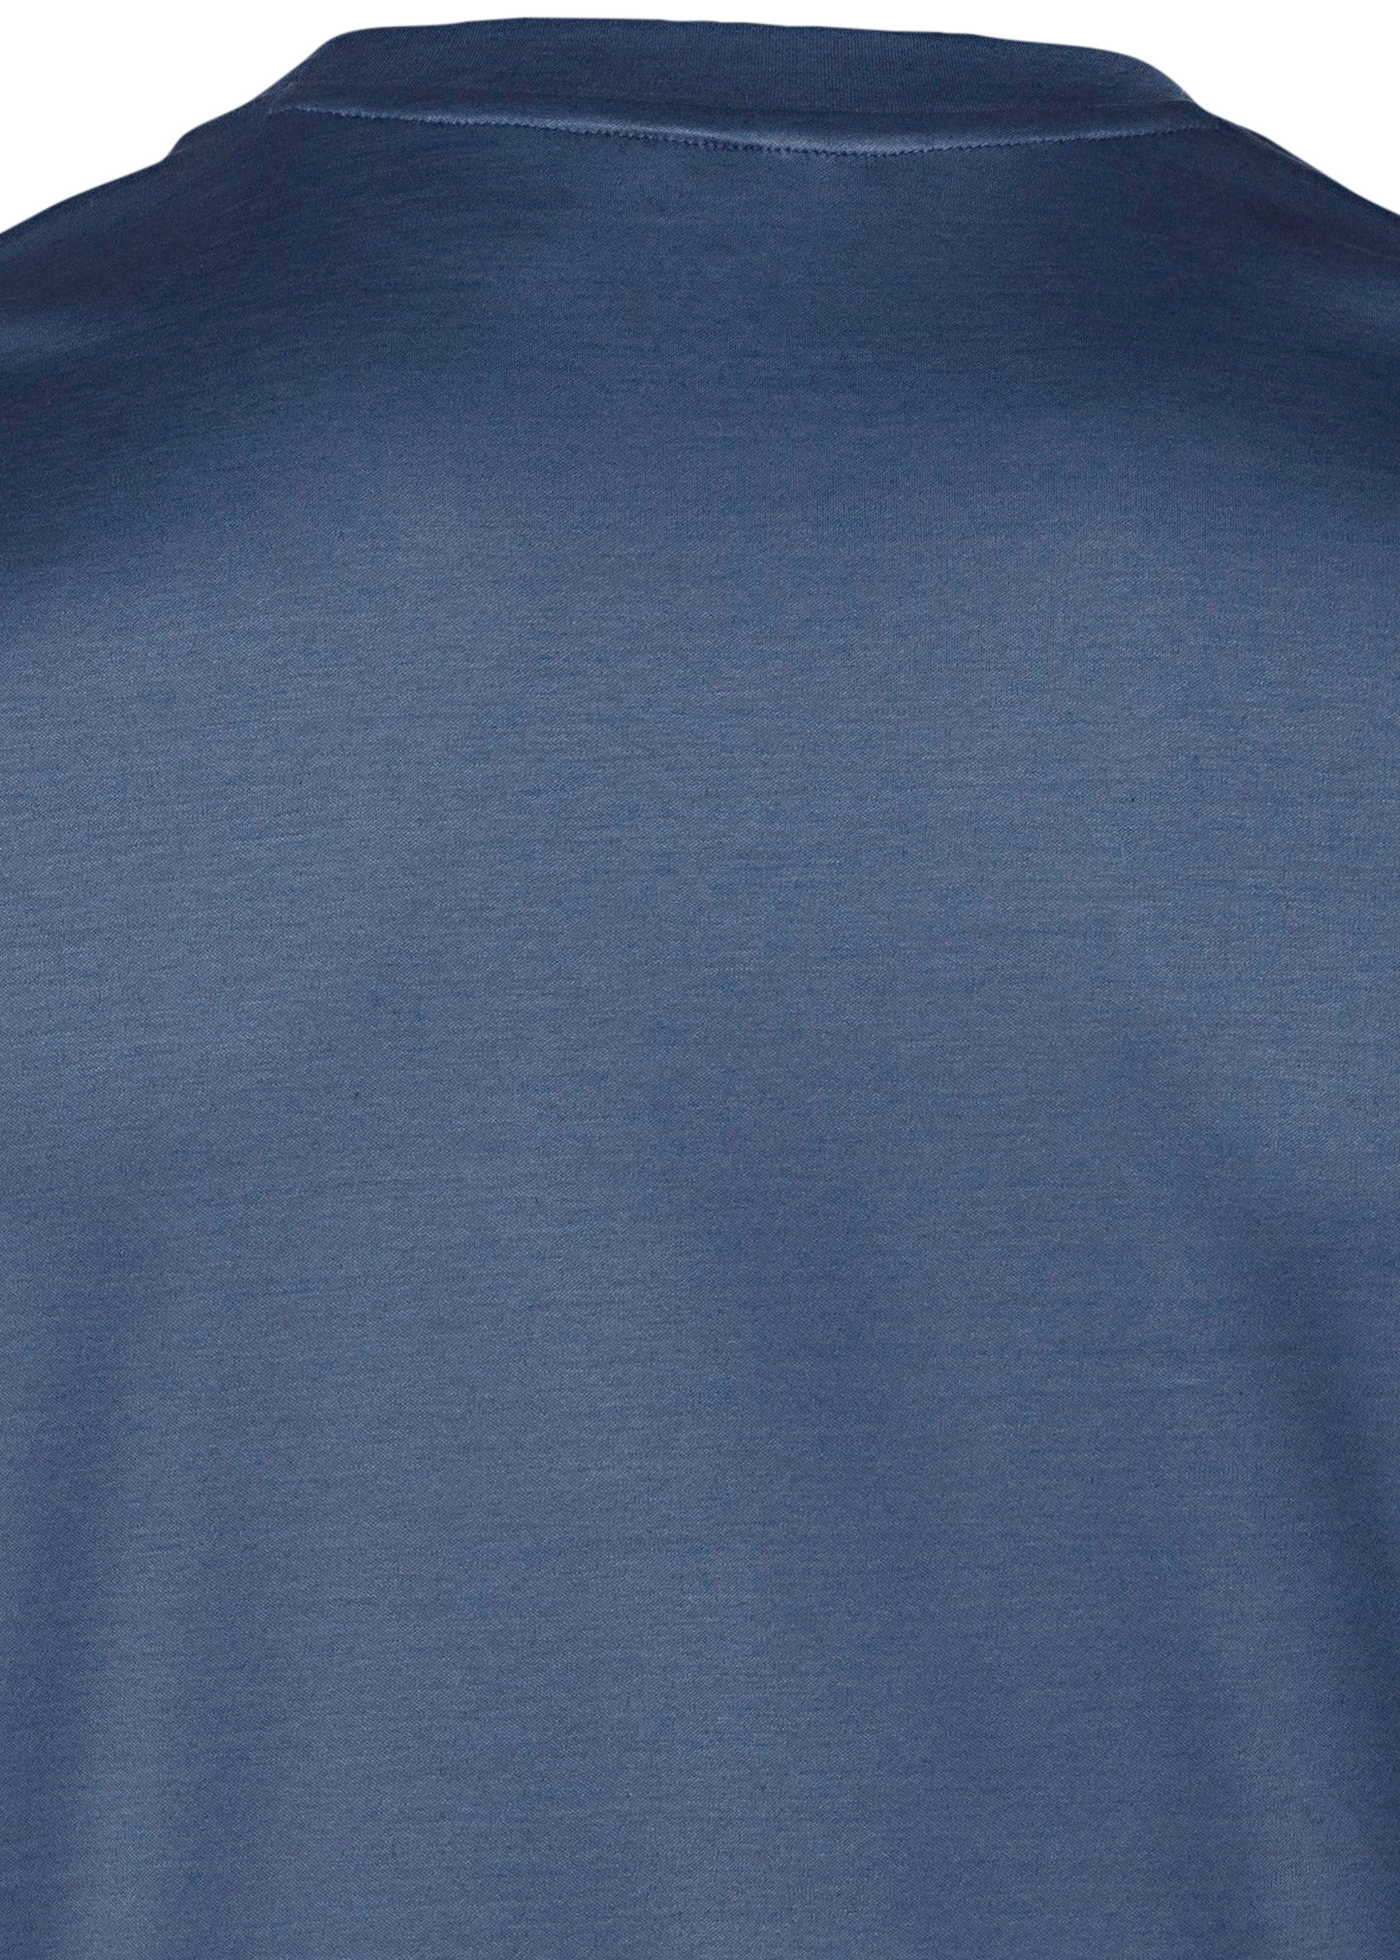 1000023561409 Men shirt: Casual / Jersey image number 3